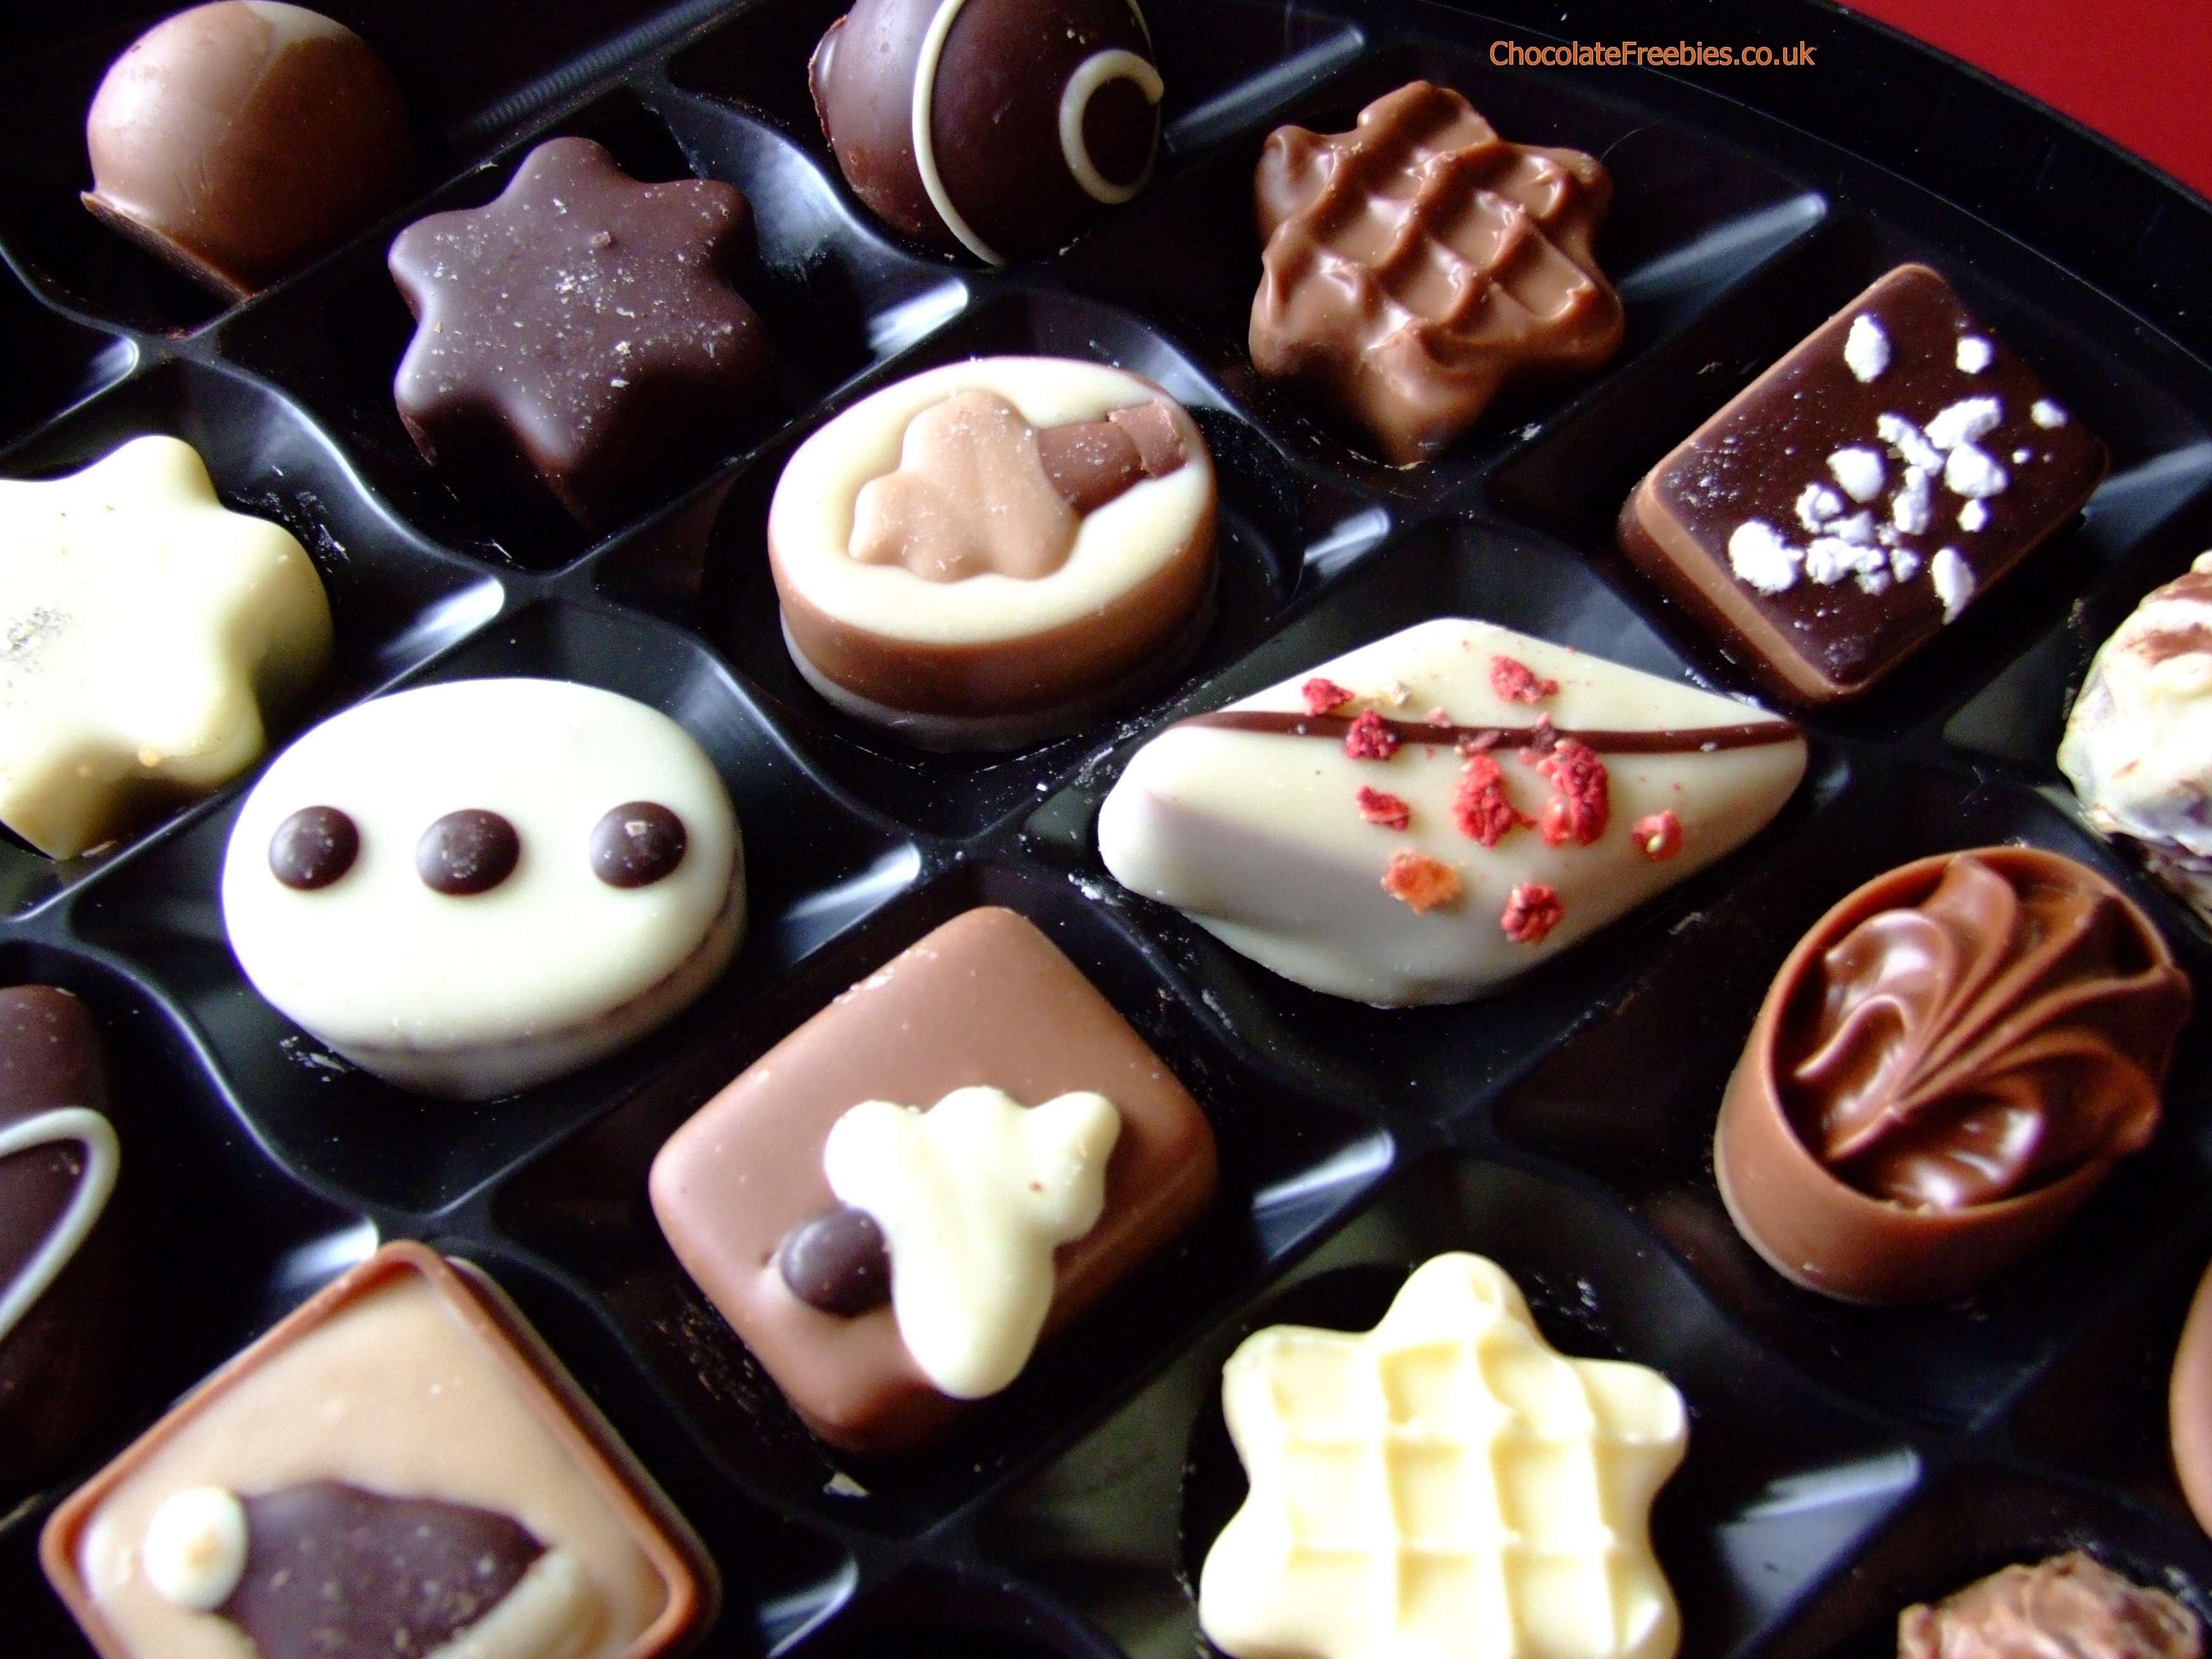 chocolates-yummmm-chocolate-36860730-3488-2616